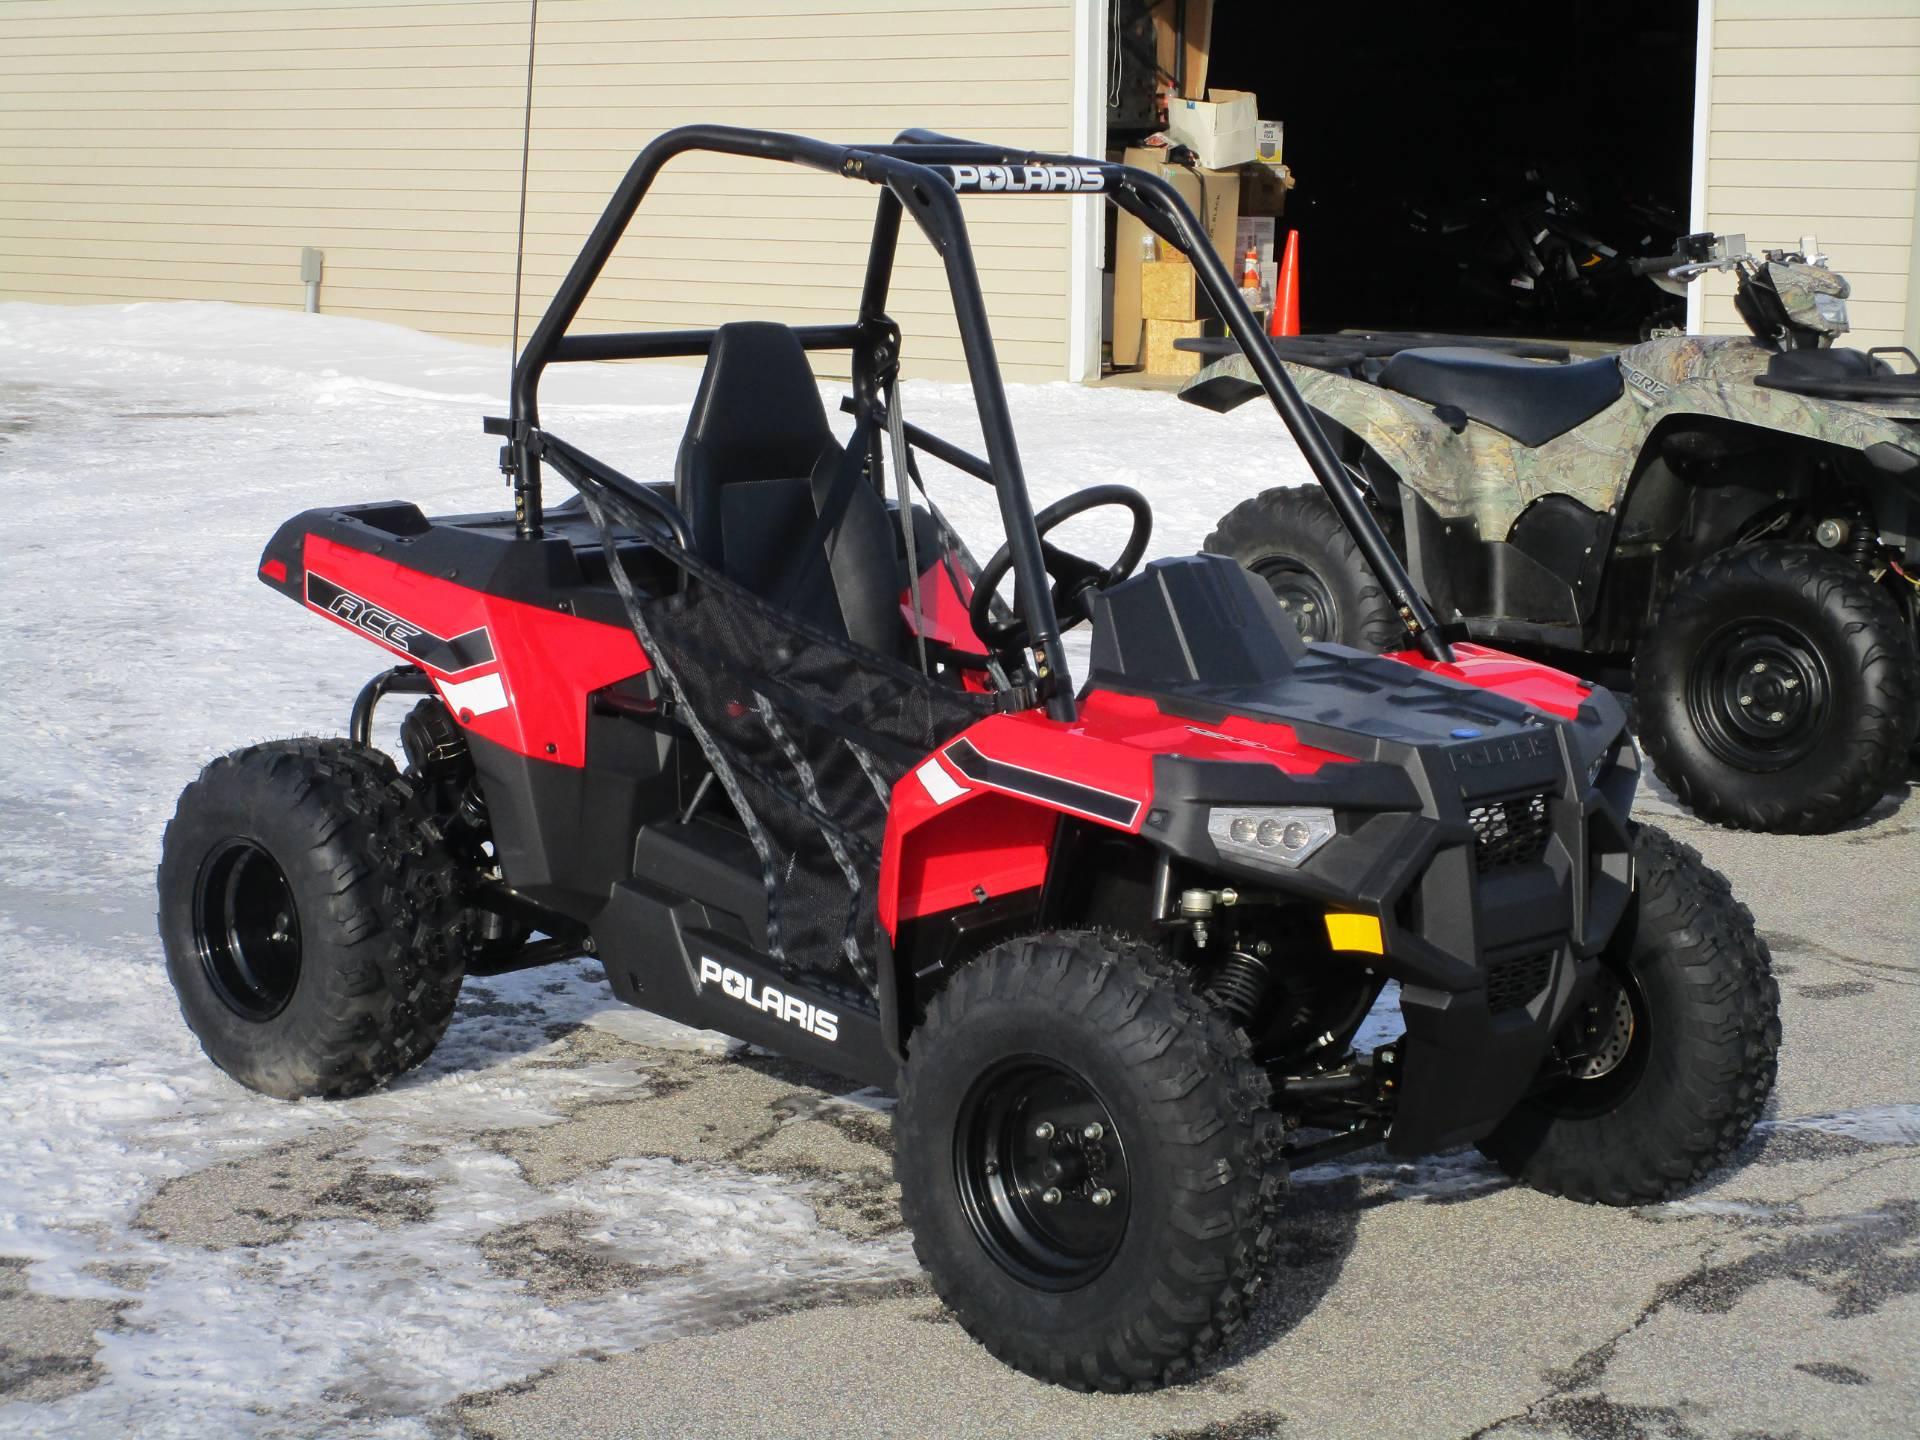 2018 Polaris Ace 150 EFI for sale 2941